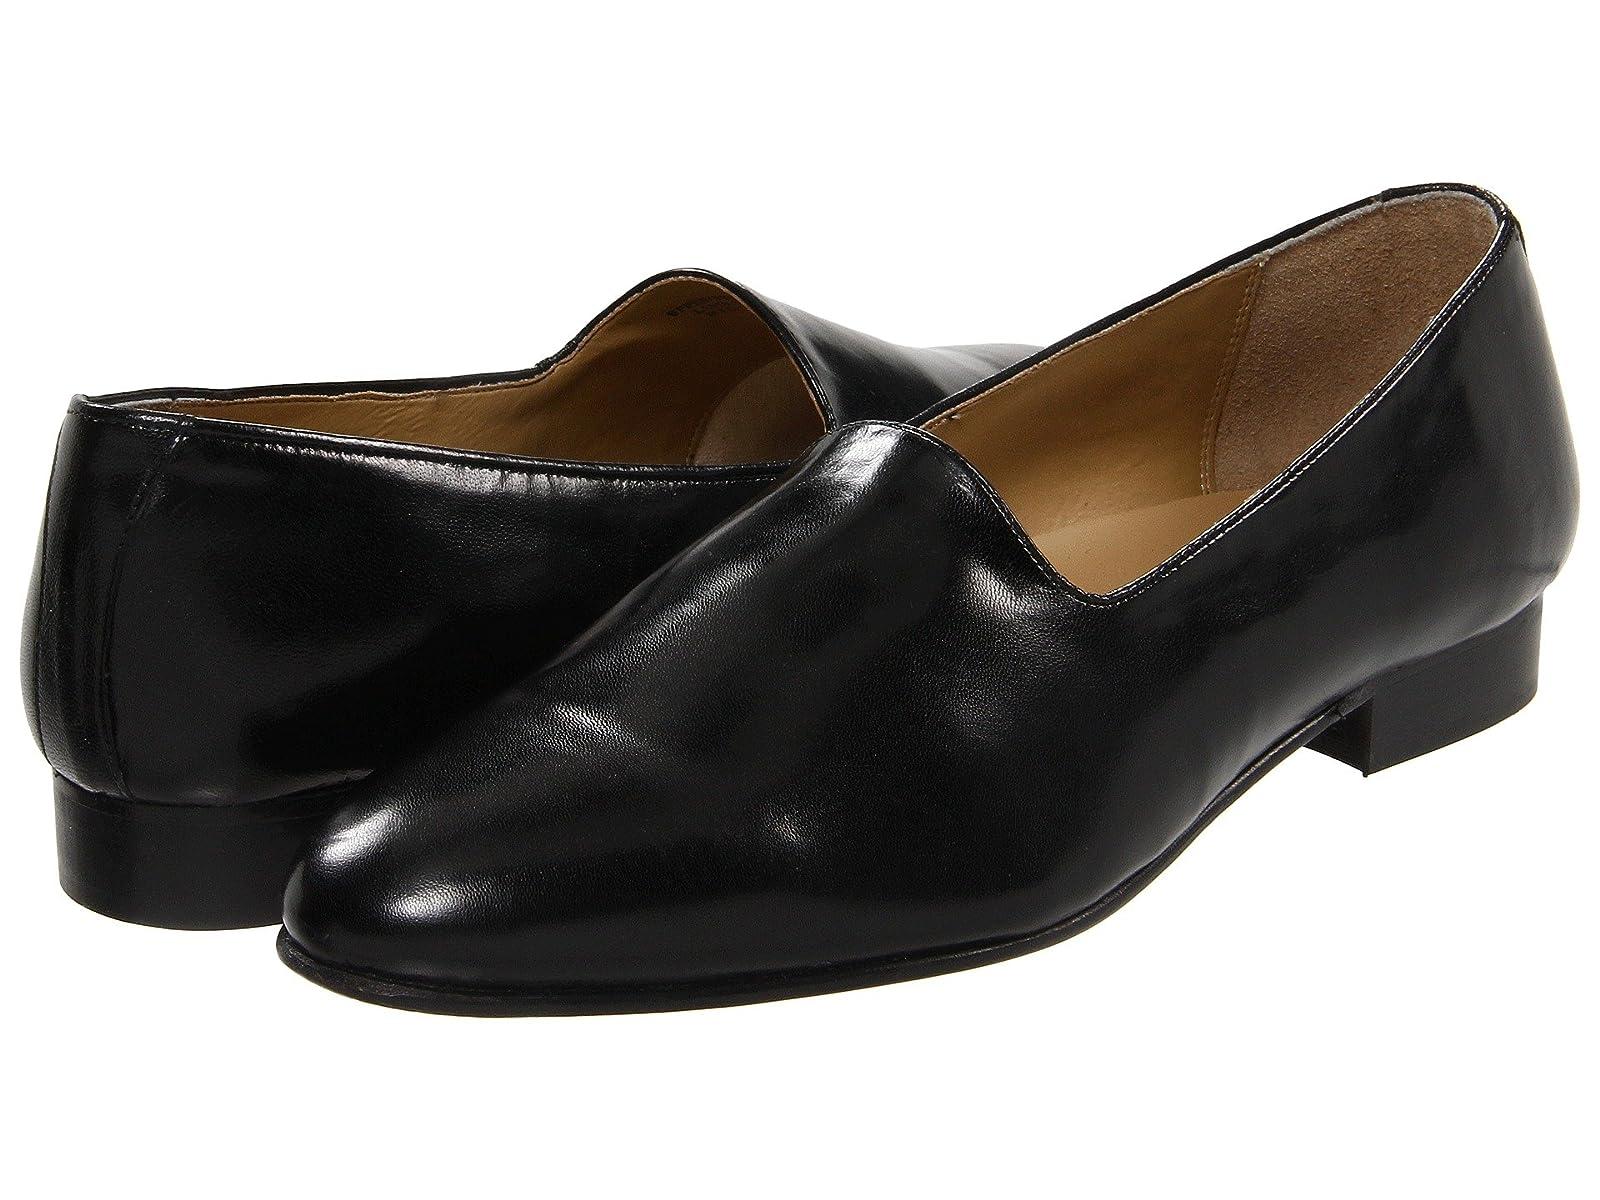 Giorgio Brutini CrawleyAtmospheric grades have affordable shoes